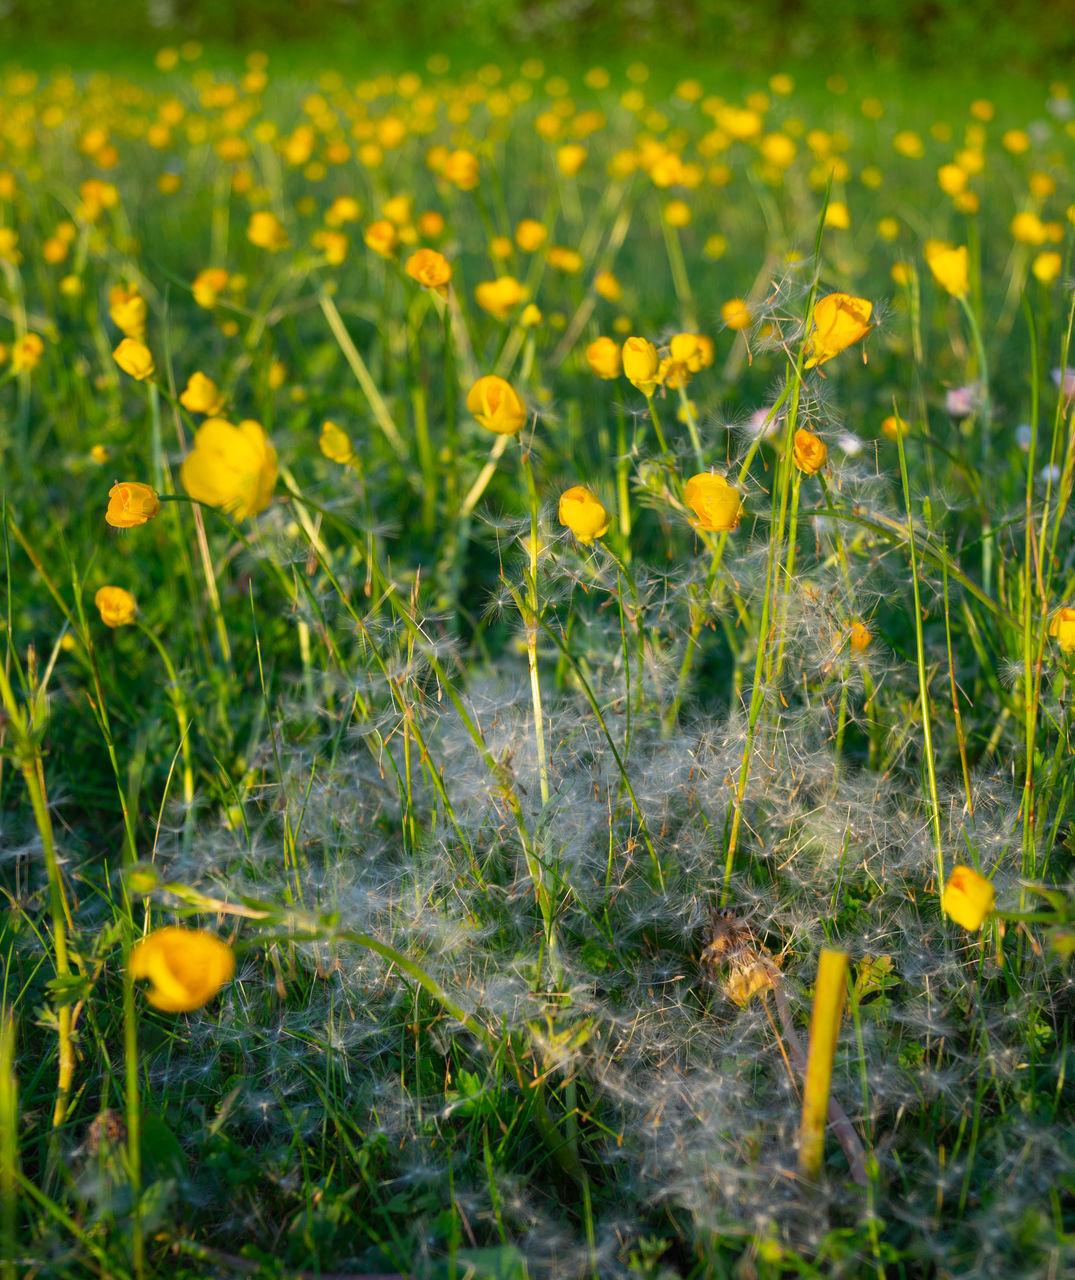 CLOSE-UP OF YELLOW CROCUS FLOWERS